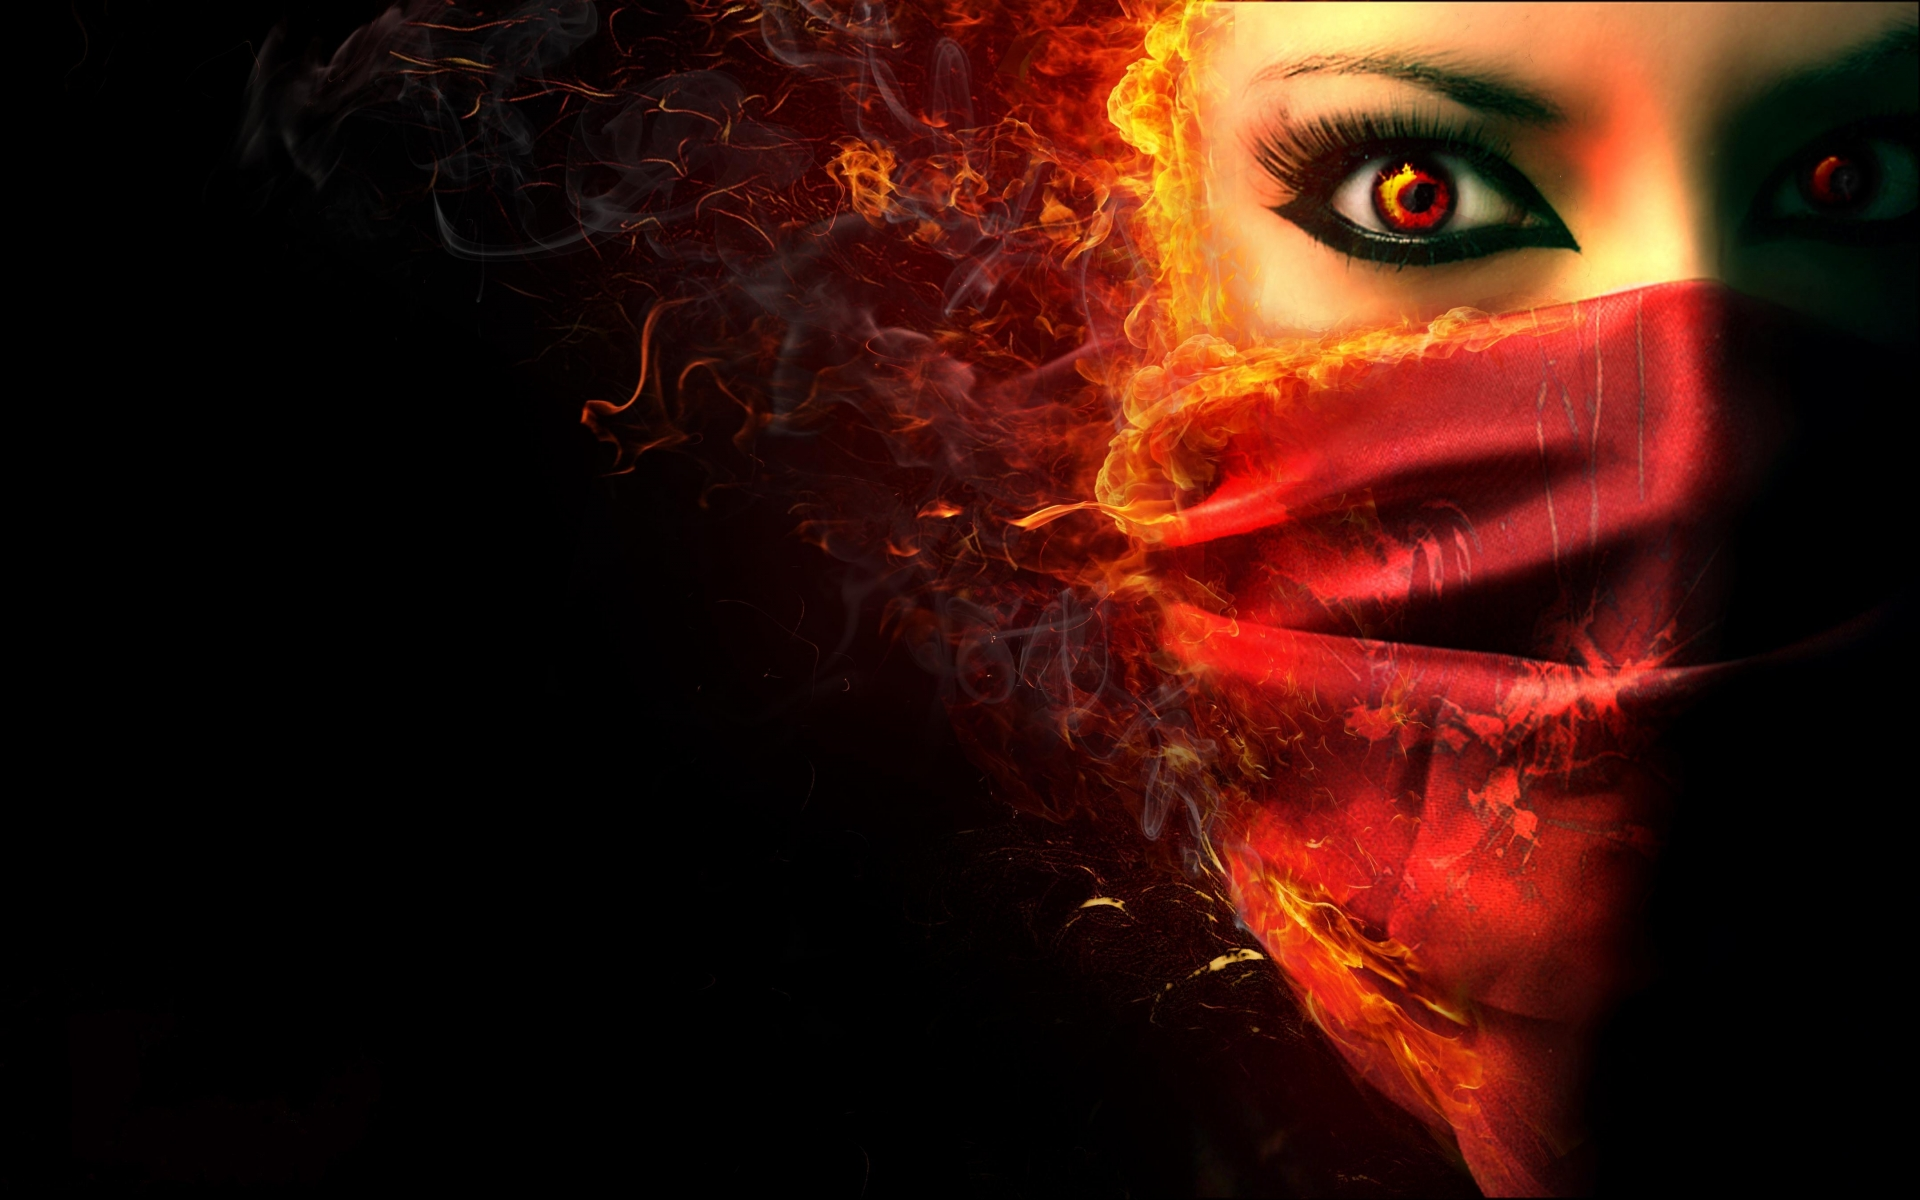 Fantasy dark horror face demon evil women wallpaper 1920x1200 1920x1200